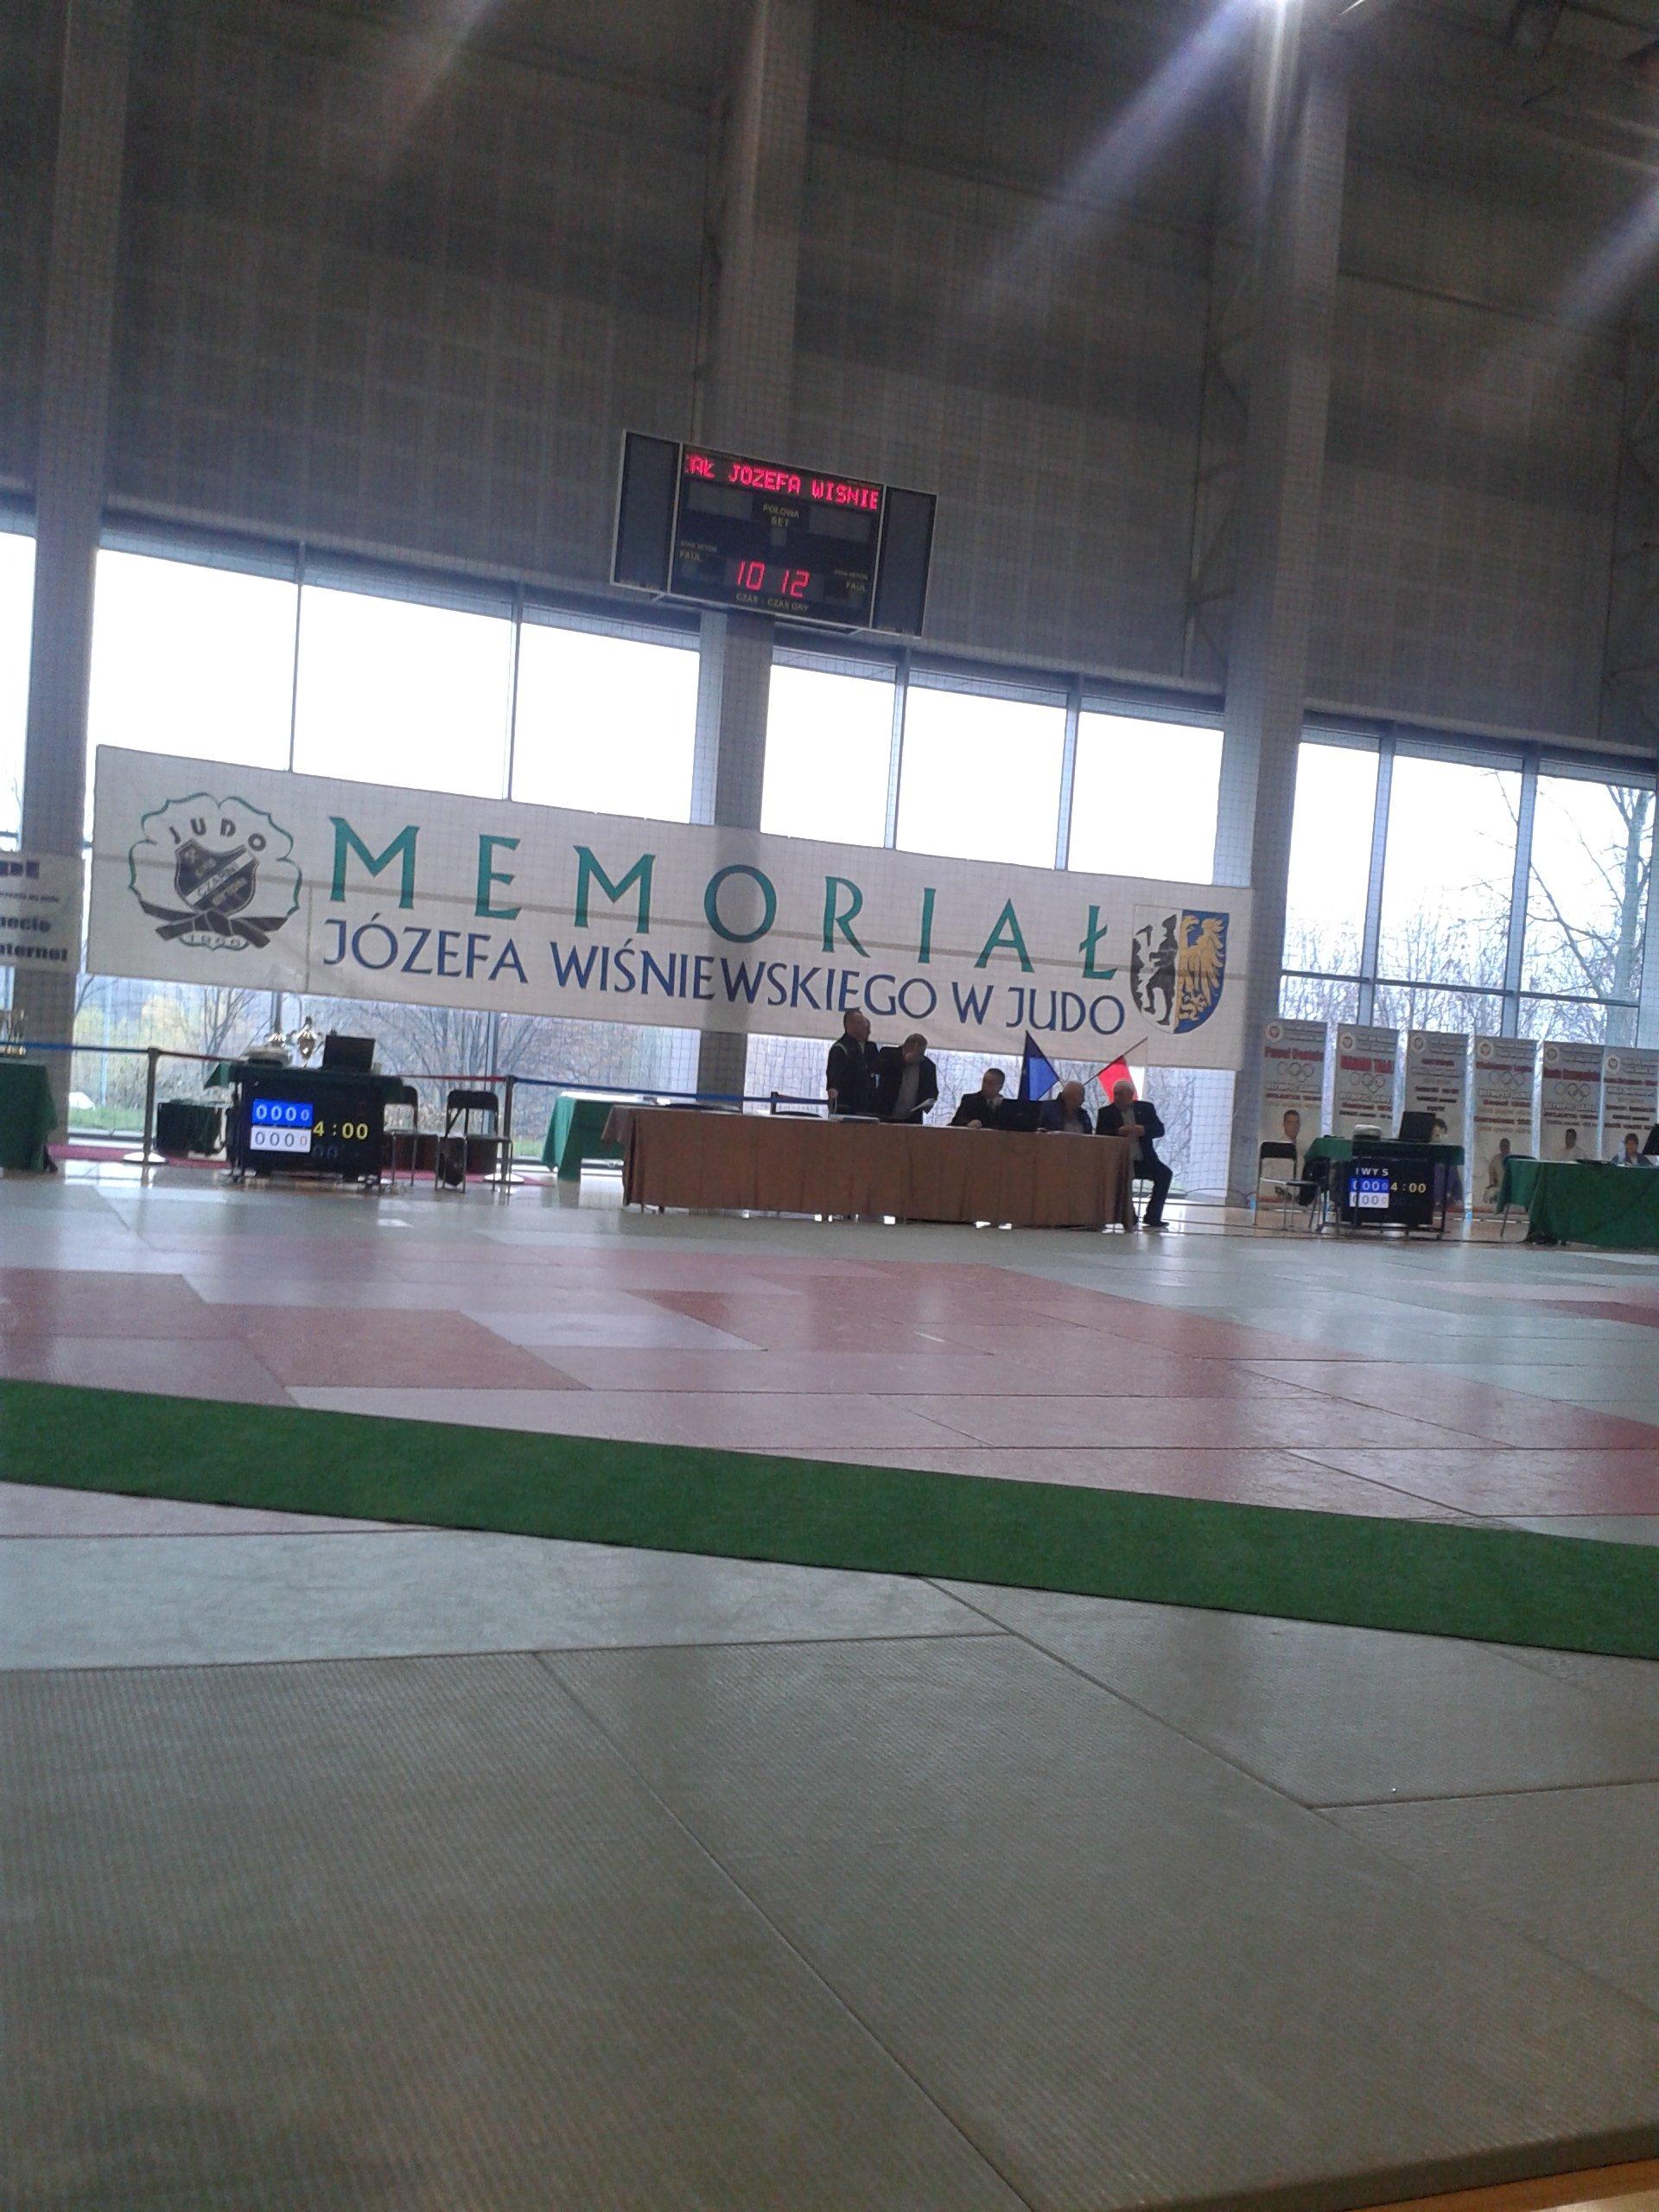 MEMORIAŁ 1